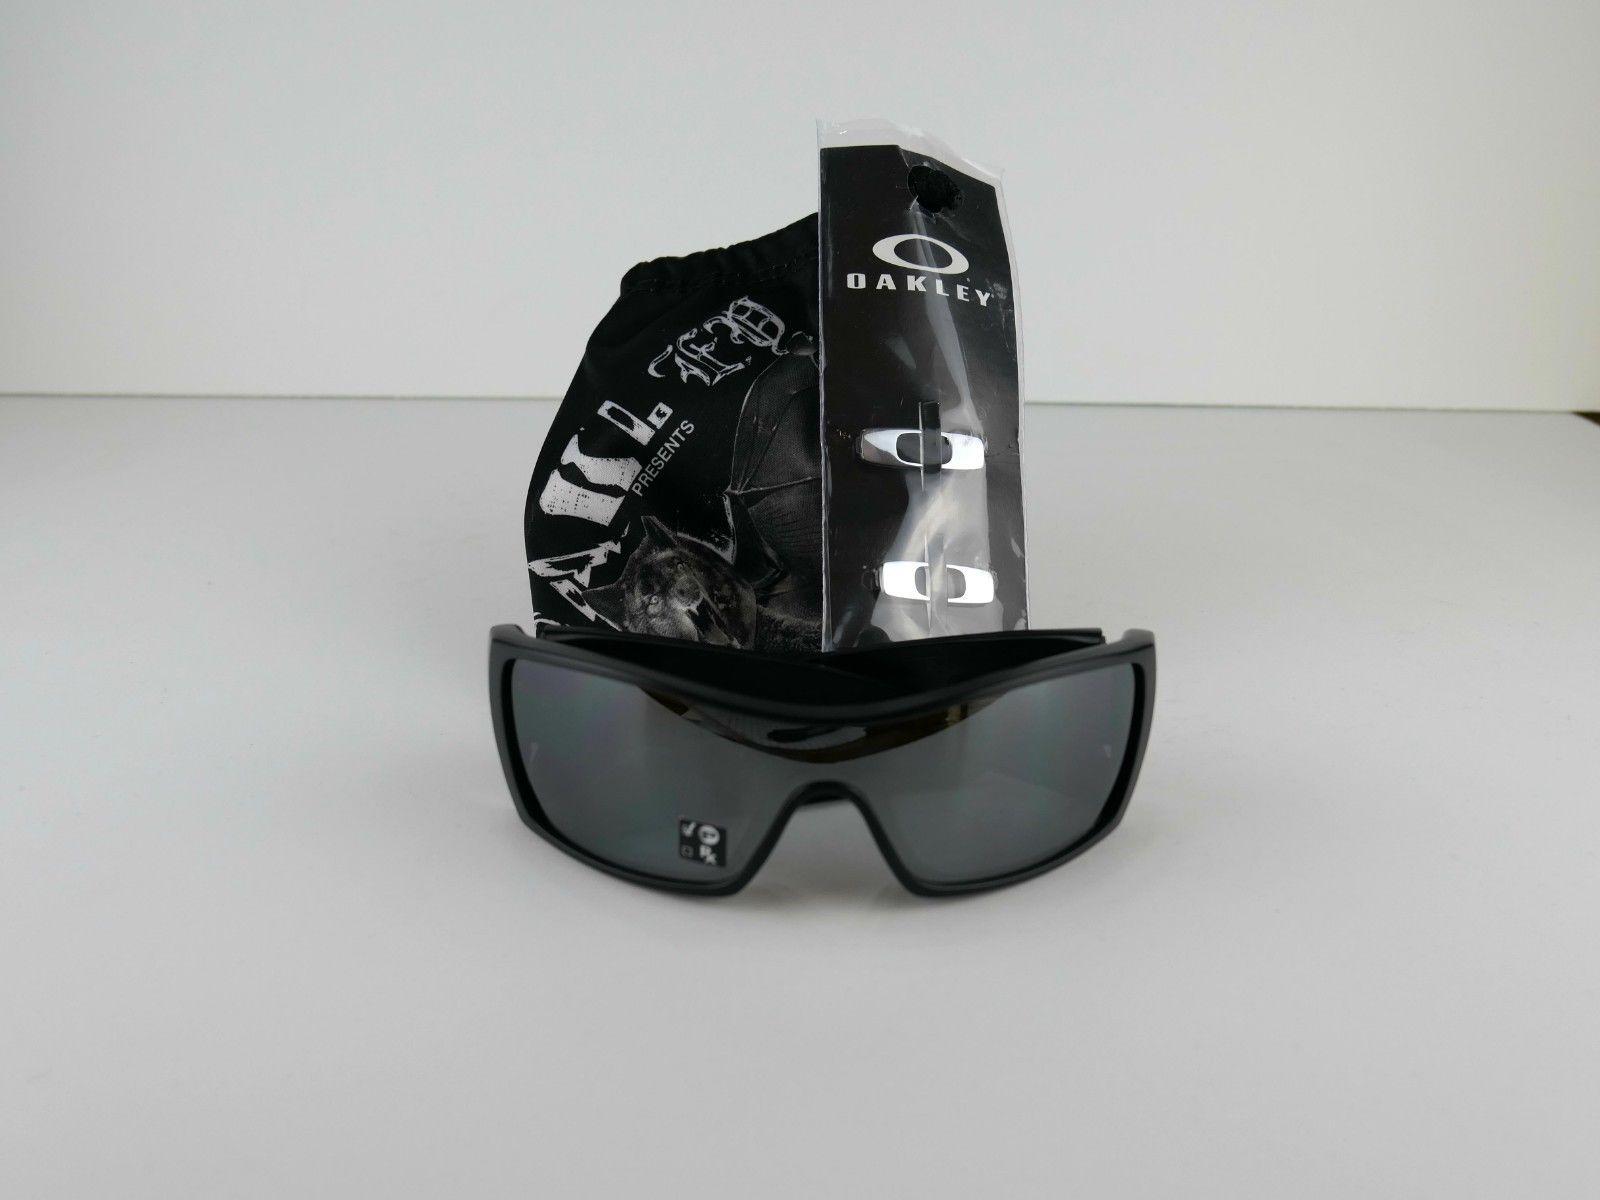 cadf406934 57. 57. Previous. Oakley Bat Wolf 009101-35 Matte Black Polarized Iridium  Sunglass Eyeglass